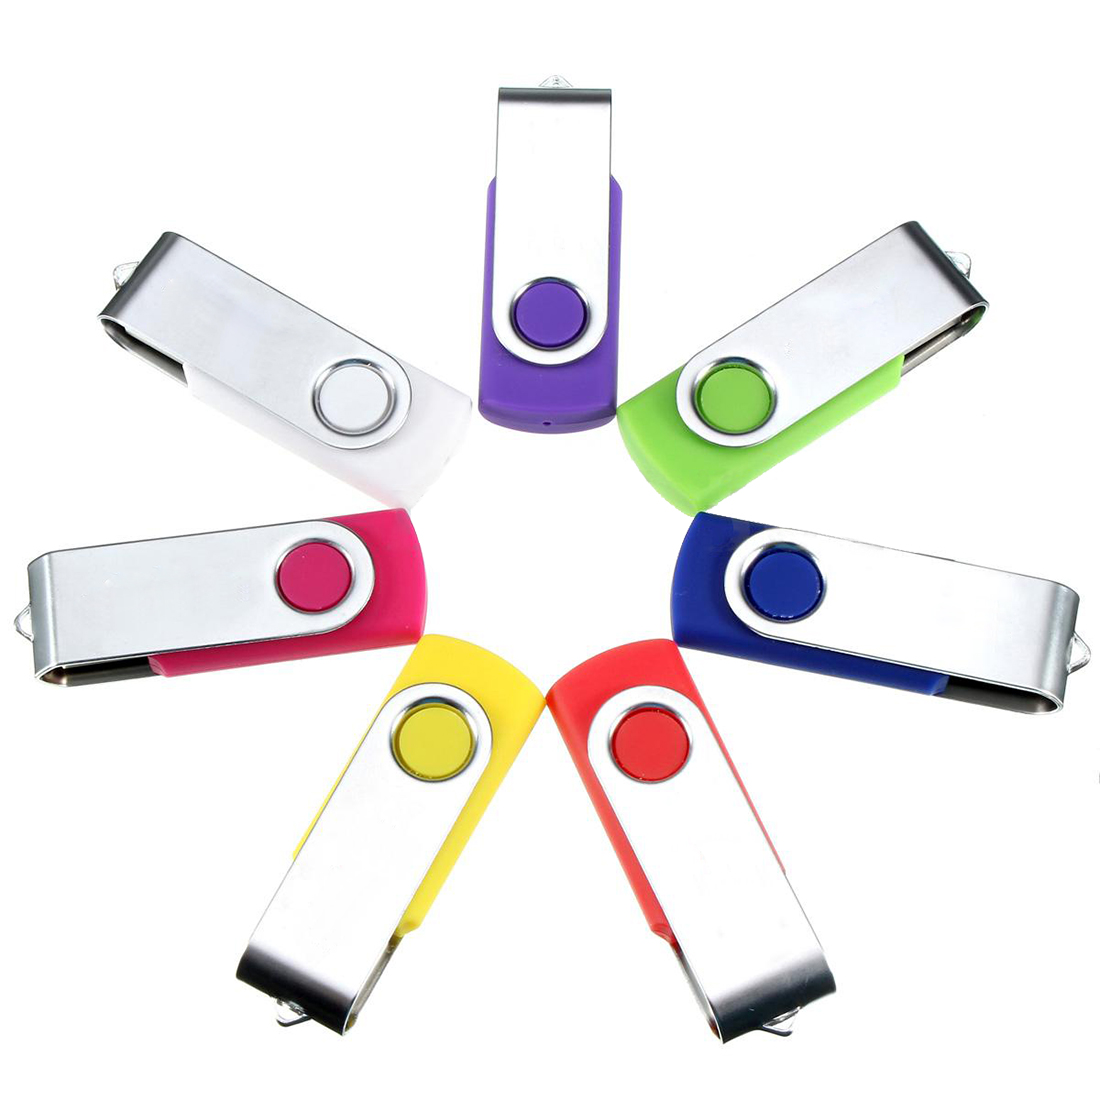 512MB 512mb USB 2.0 Flash Driver Memory Thumb Stick Storage Drive Pen Gift US